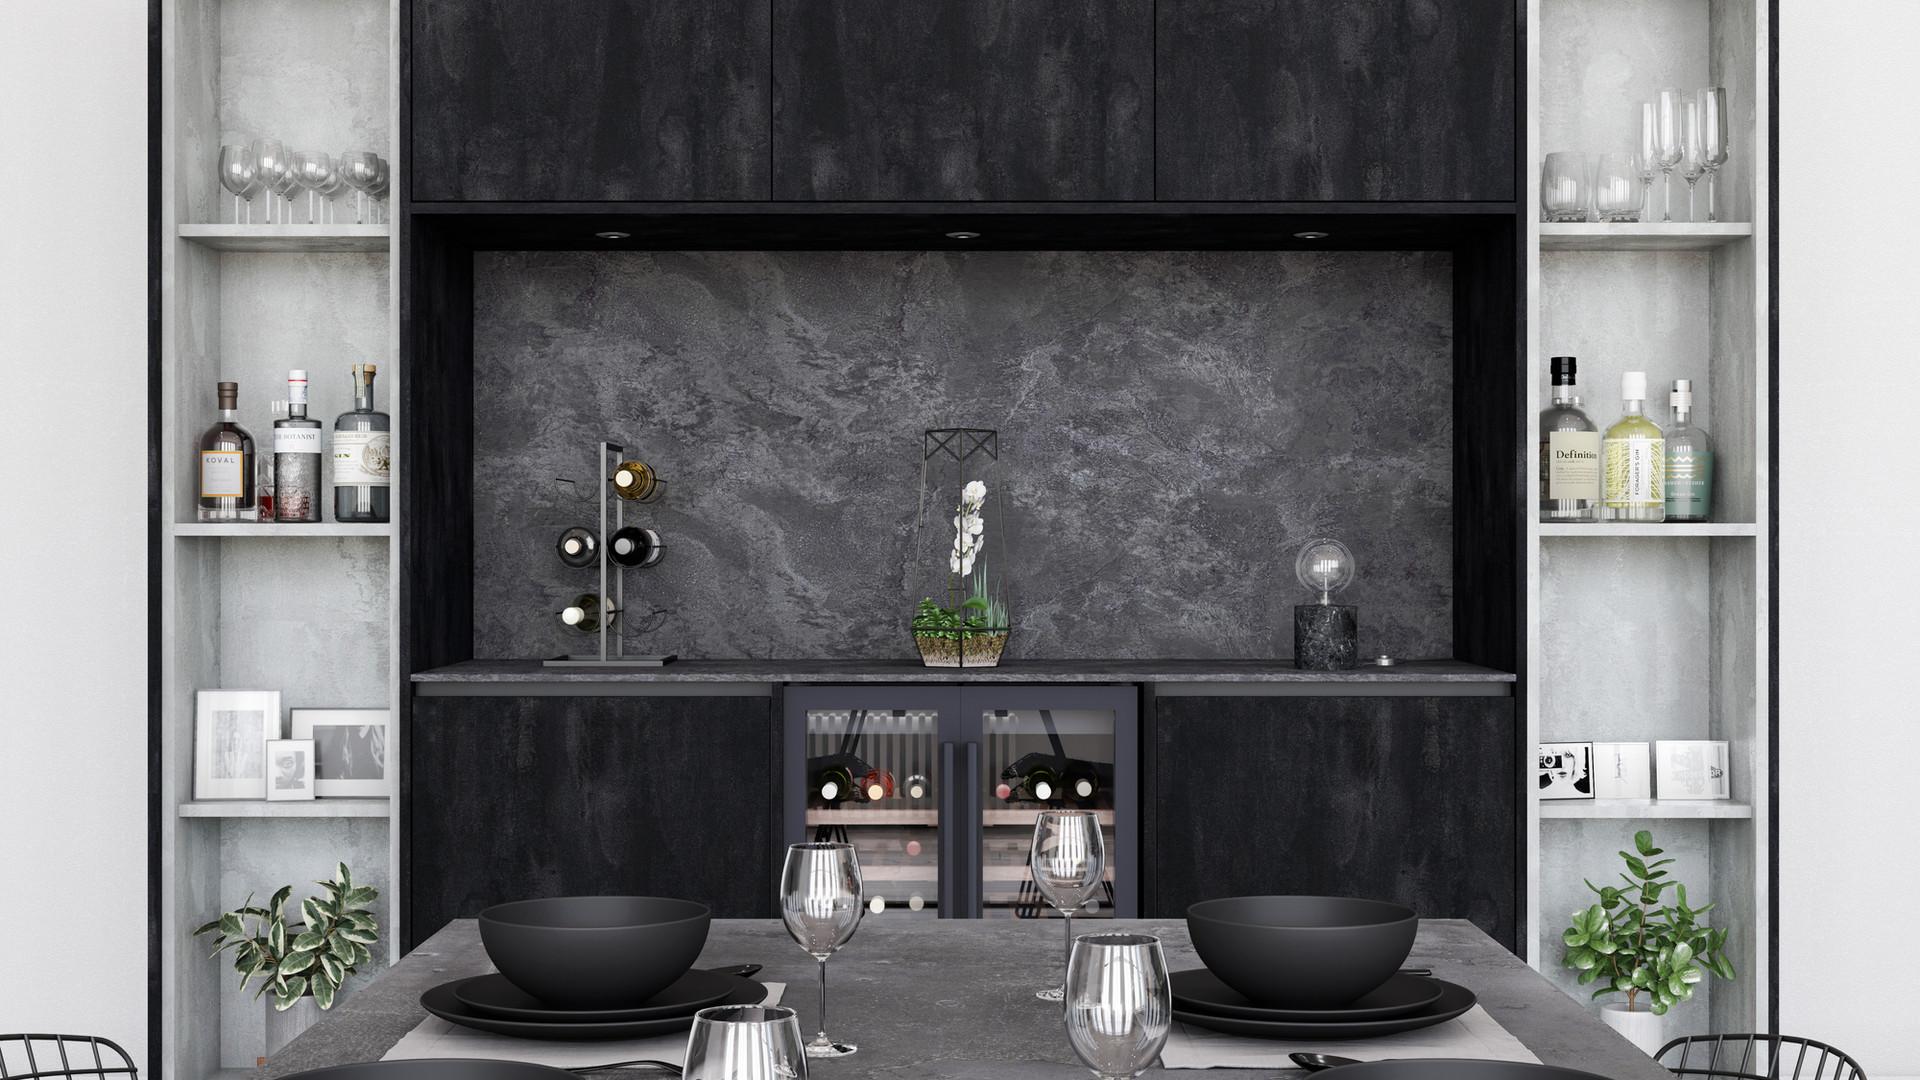 Linden Concrete Flow and Charcoal Flow (